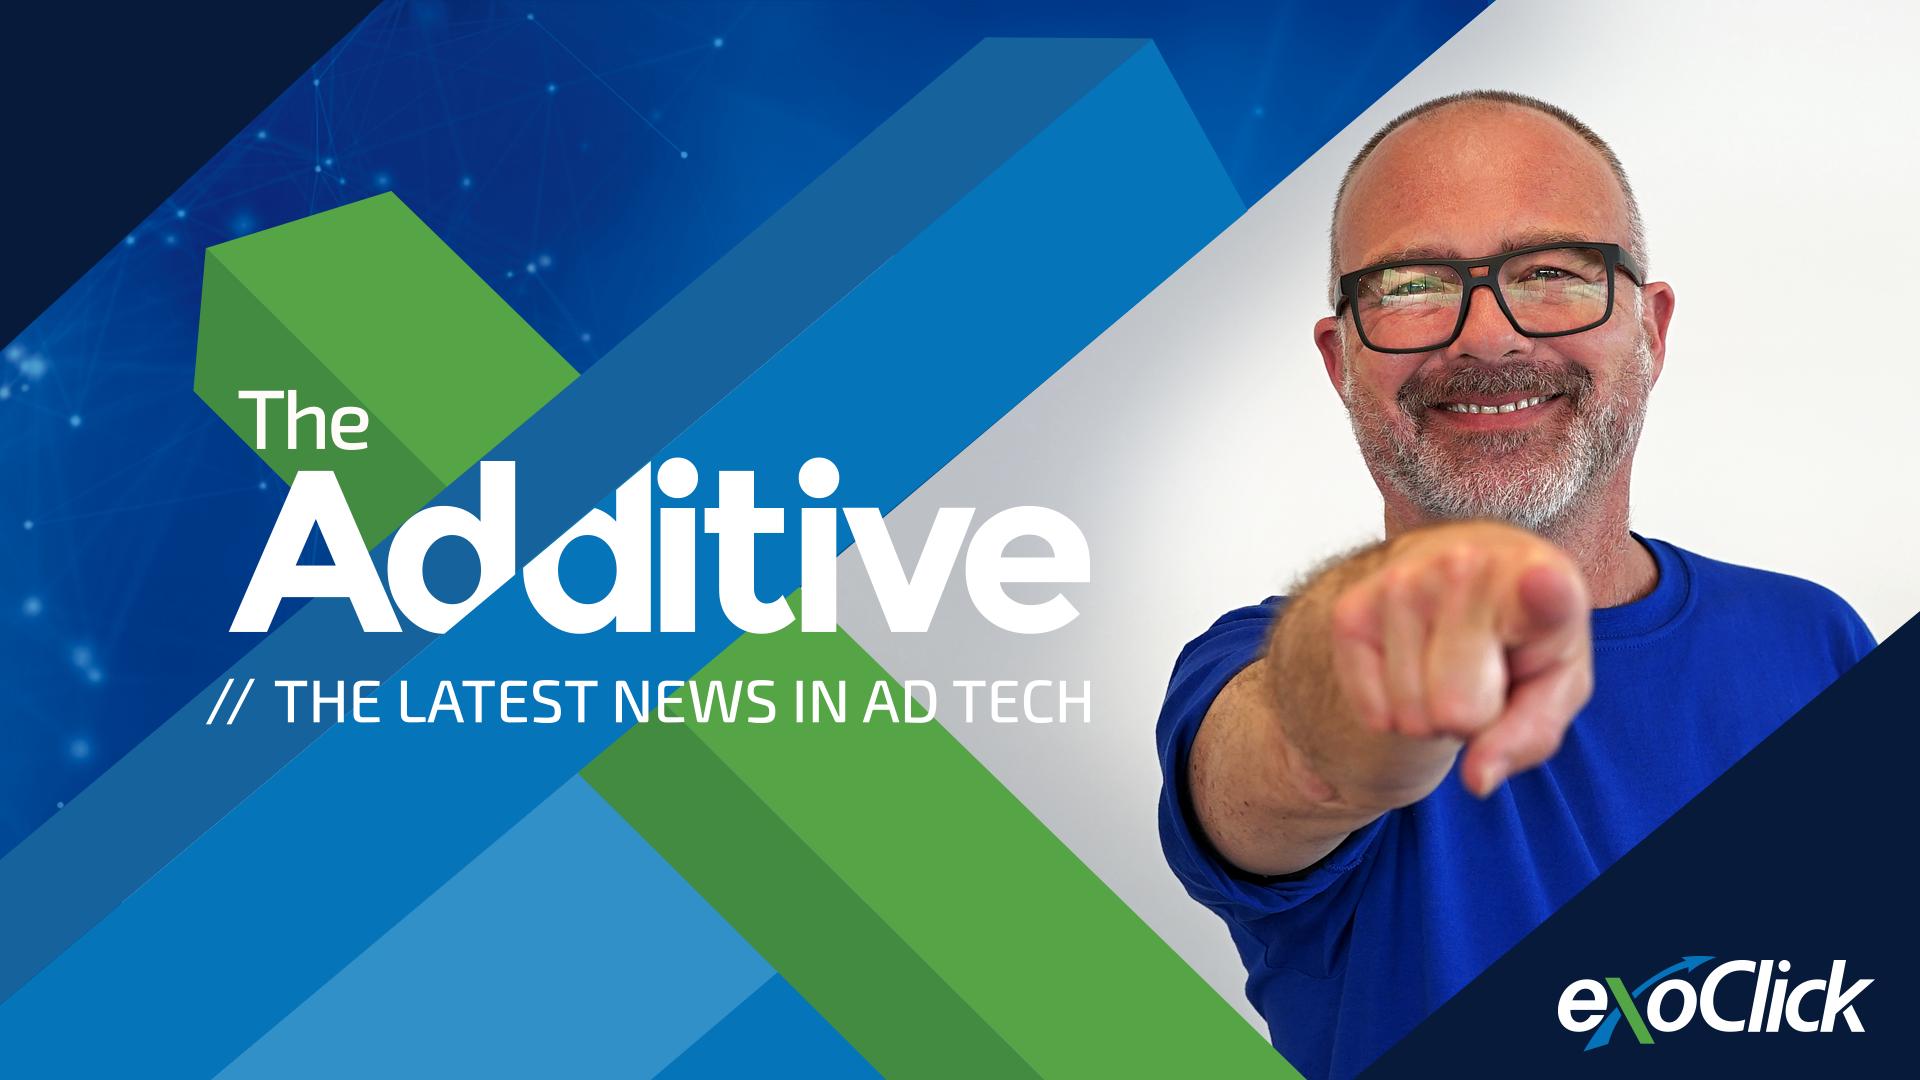 The Additive February 2021!